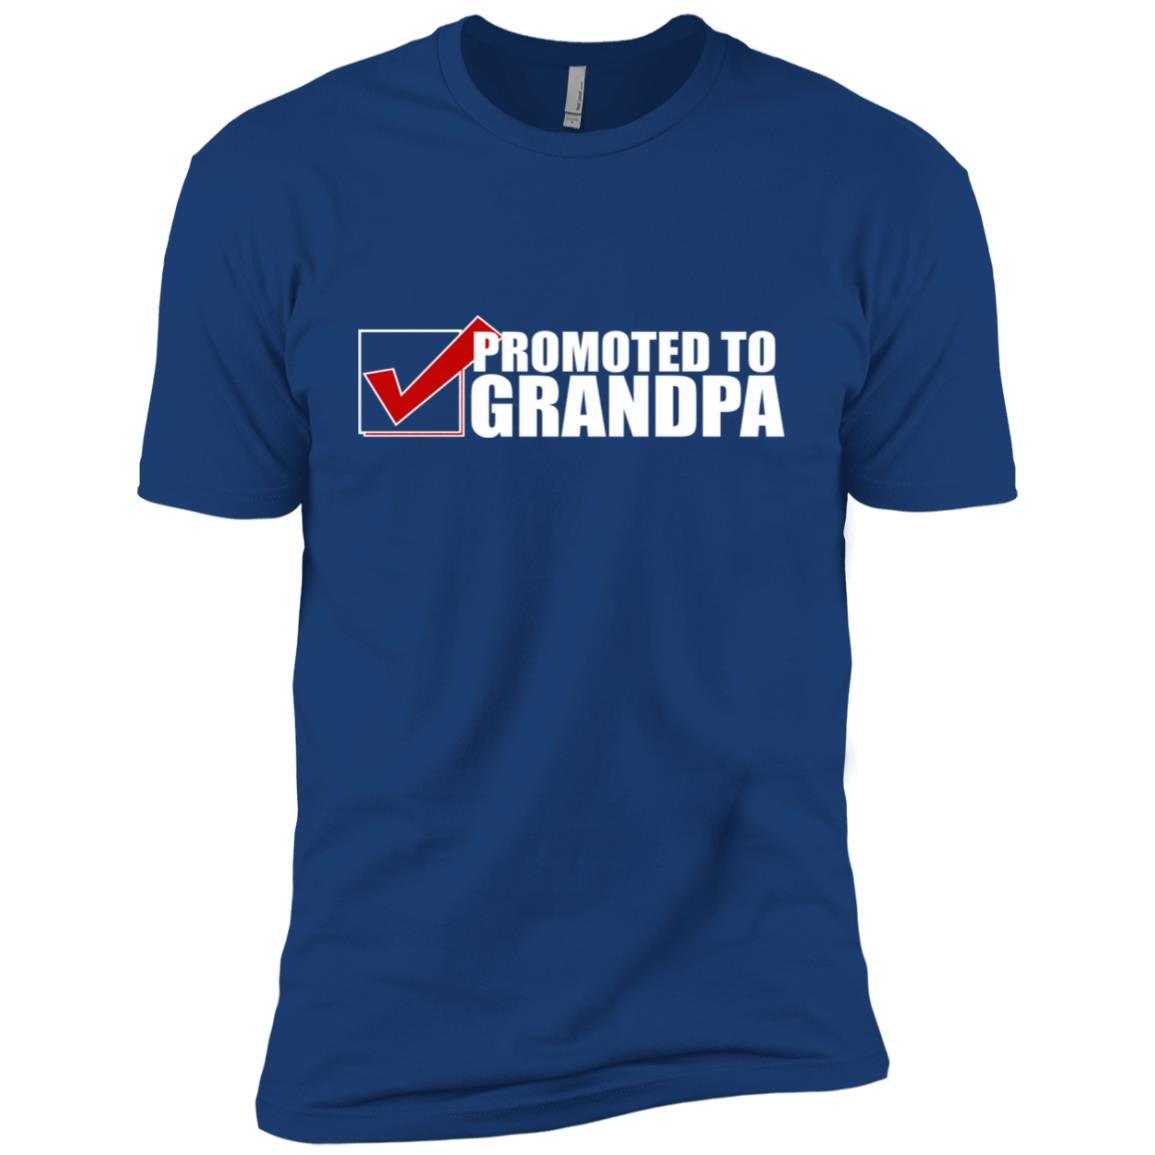 New Grandpa Promoted To Grandpa Announcement Tee Men Short Sleeve T-Shirt